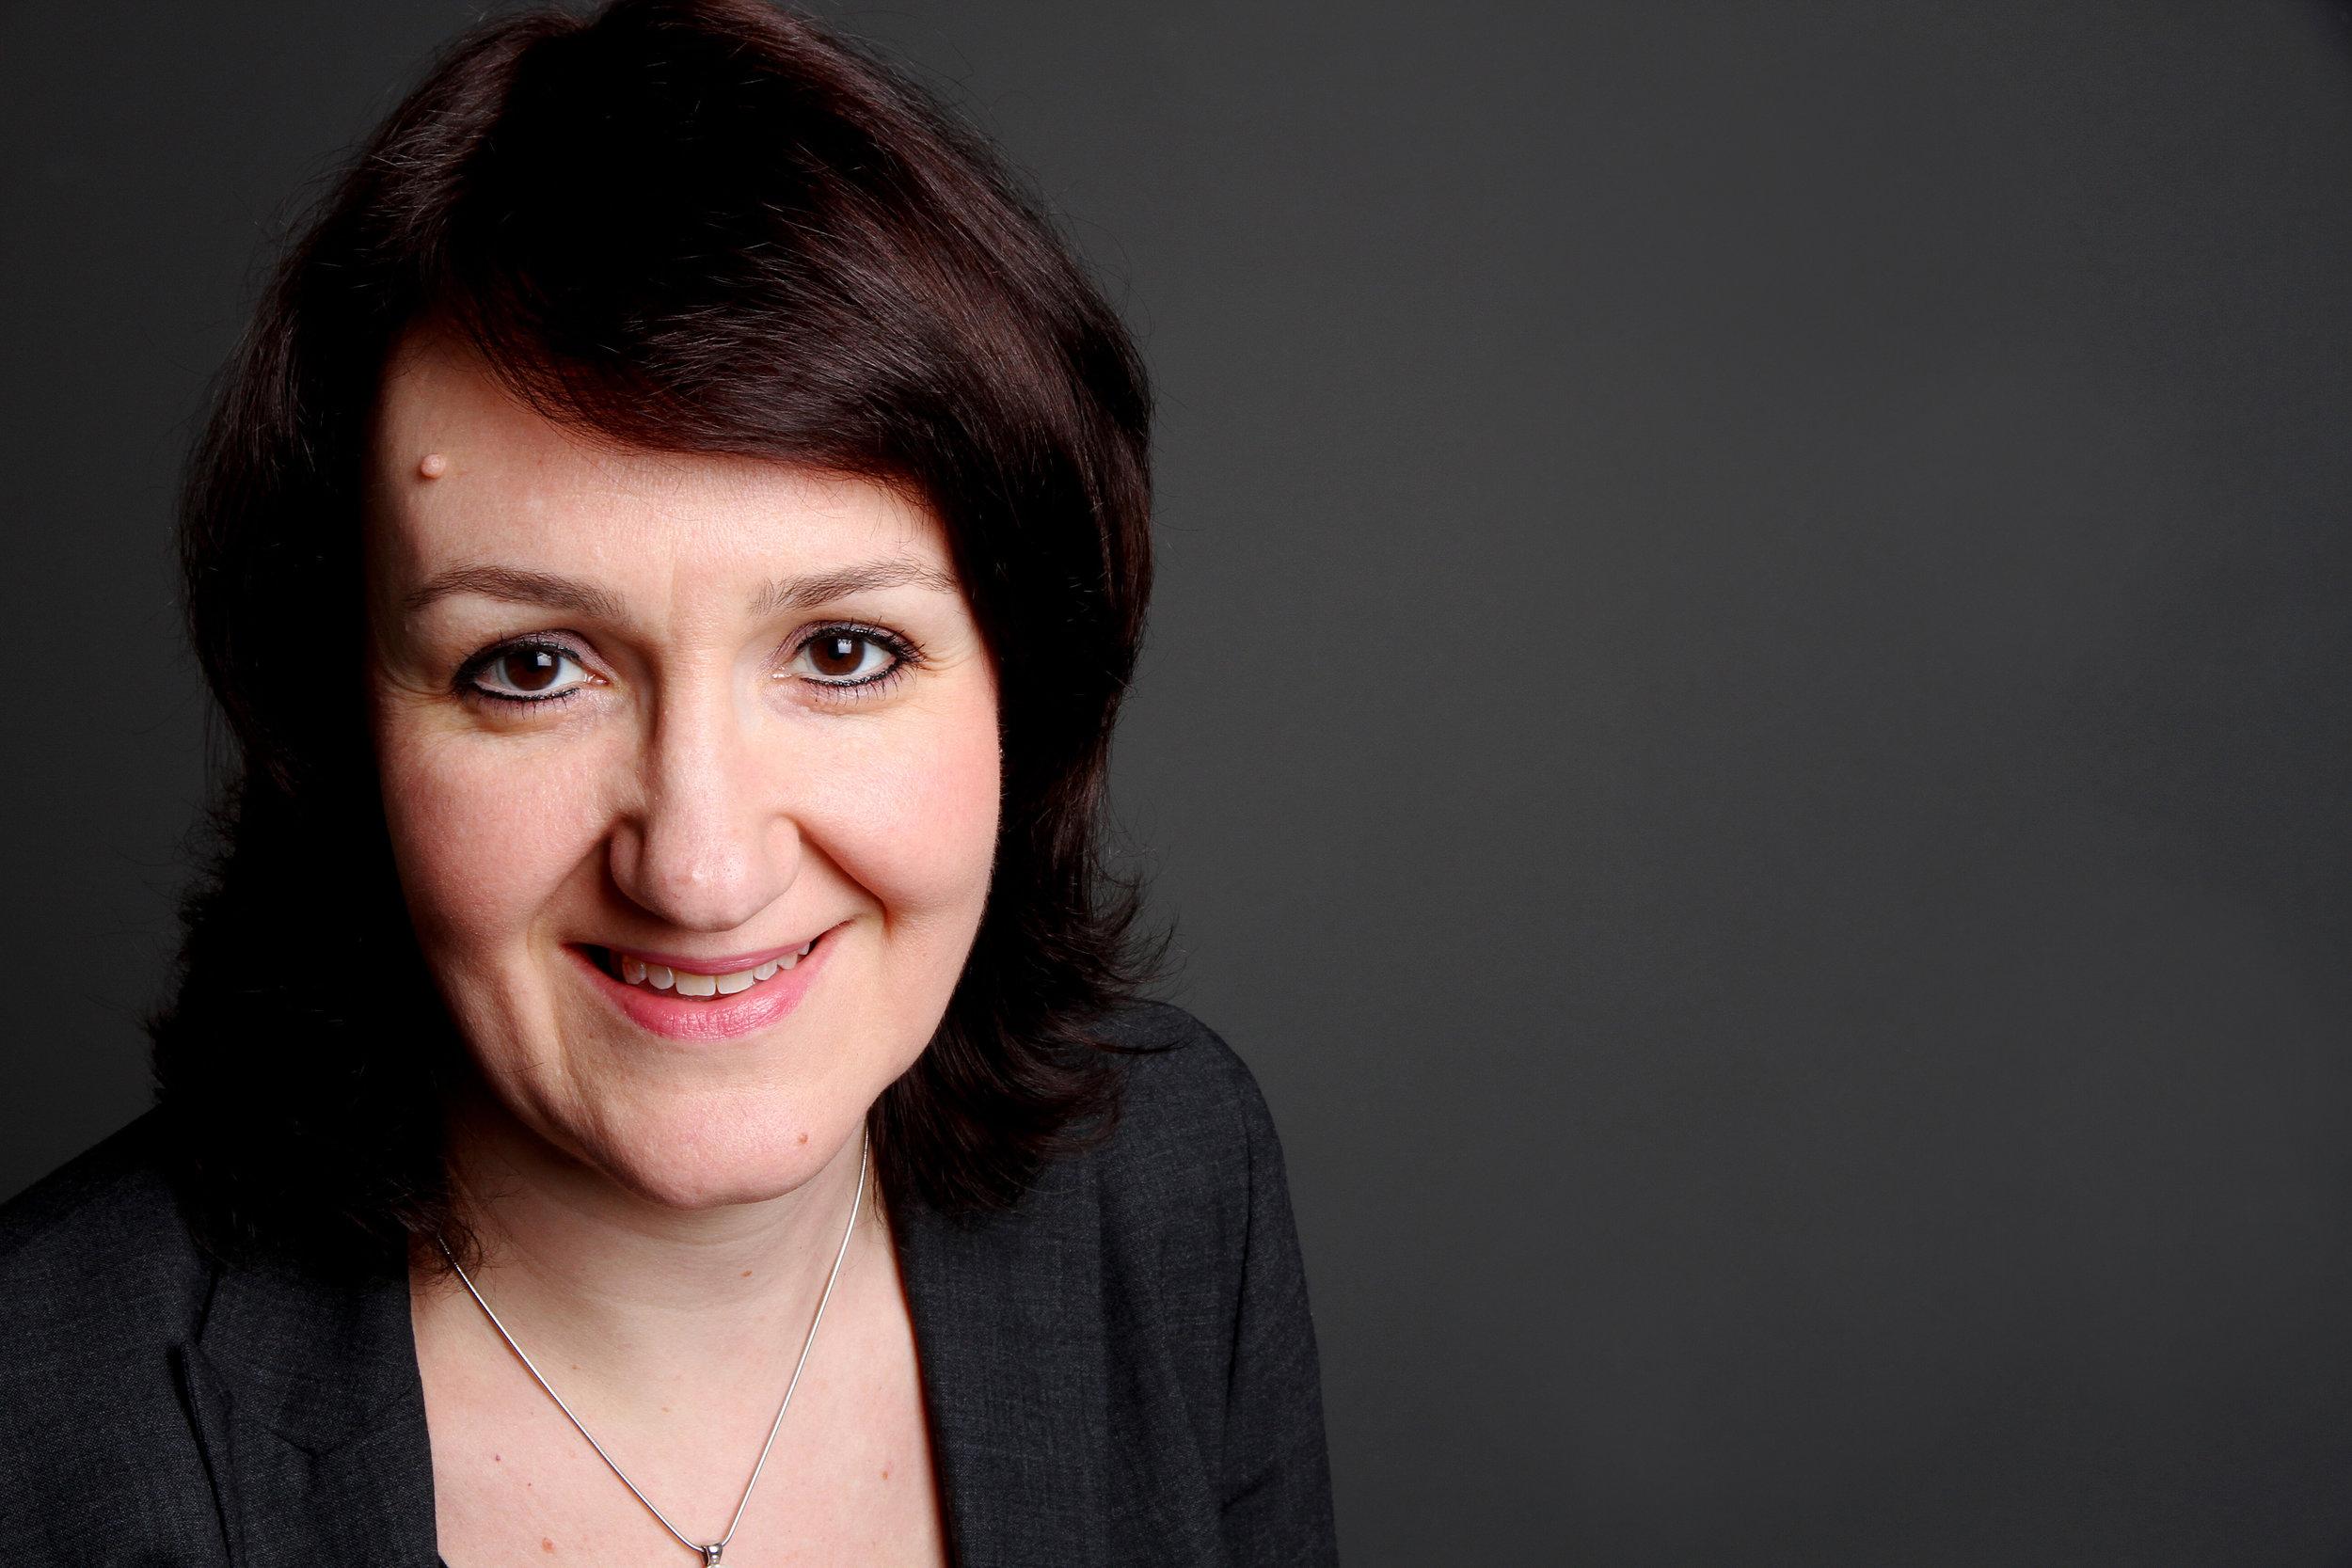 Marija Mijalkovic, IBM Canada